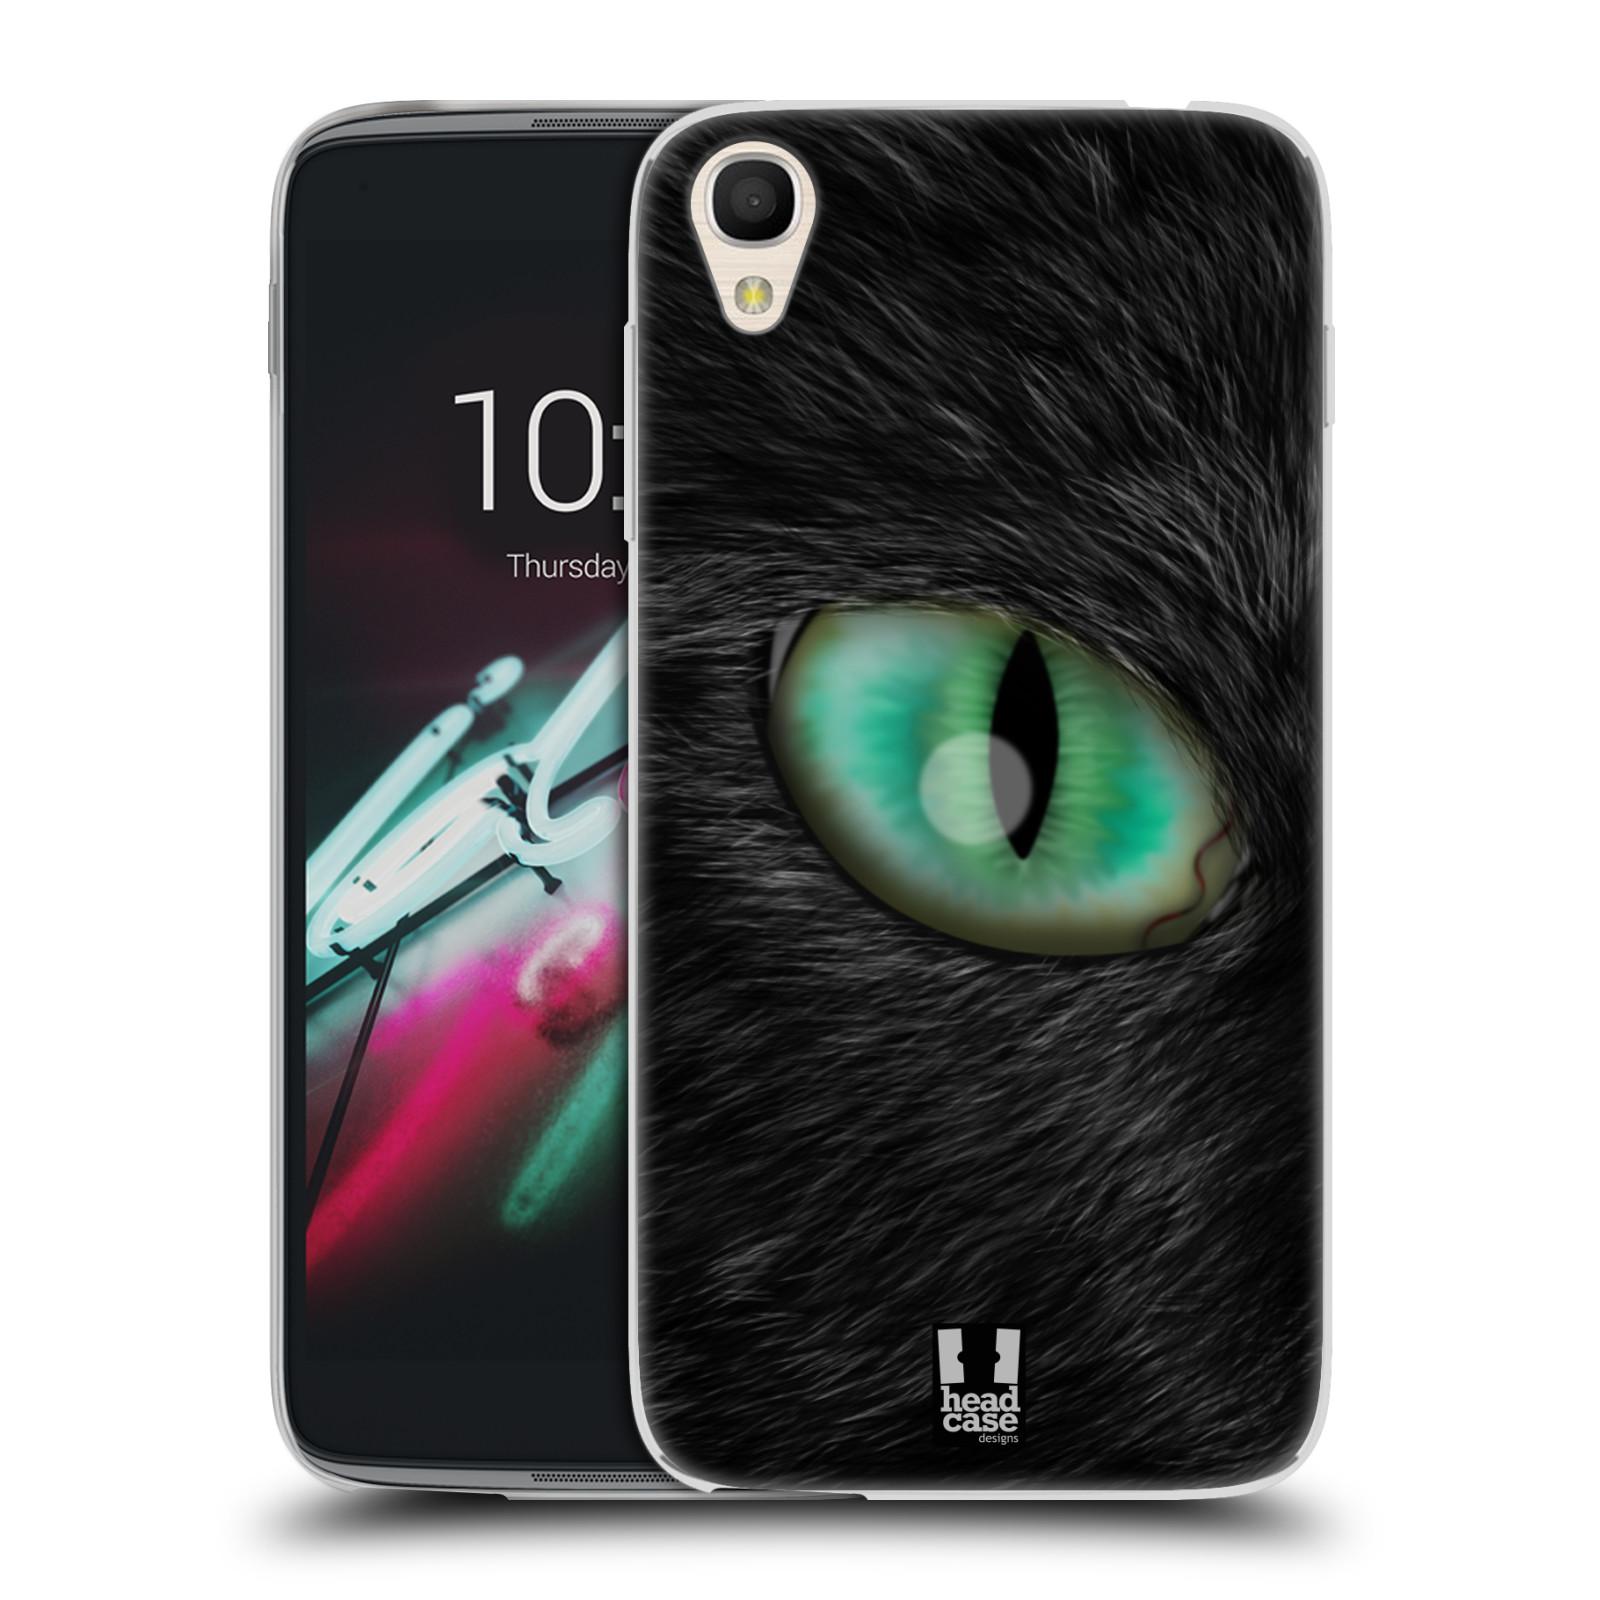 HEAD CASE silikonový obal na mobil Alcatel Idol 3 OT-6039Y (4.7) vzor pohled zvířete oko kočka